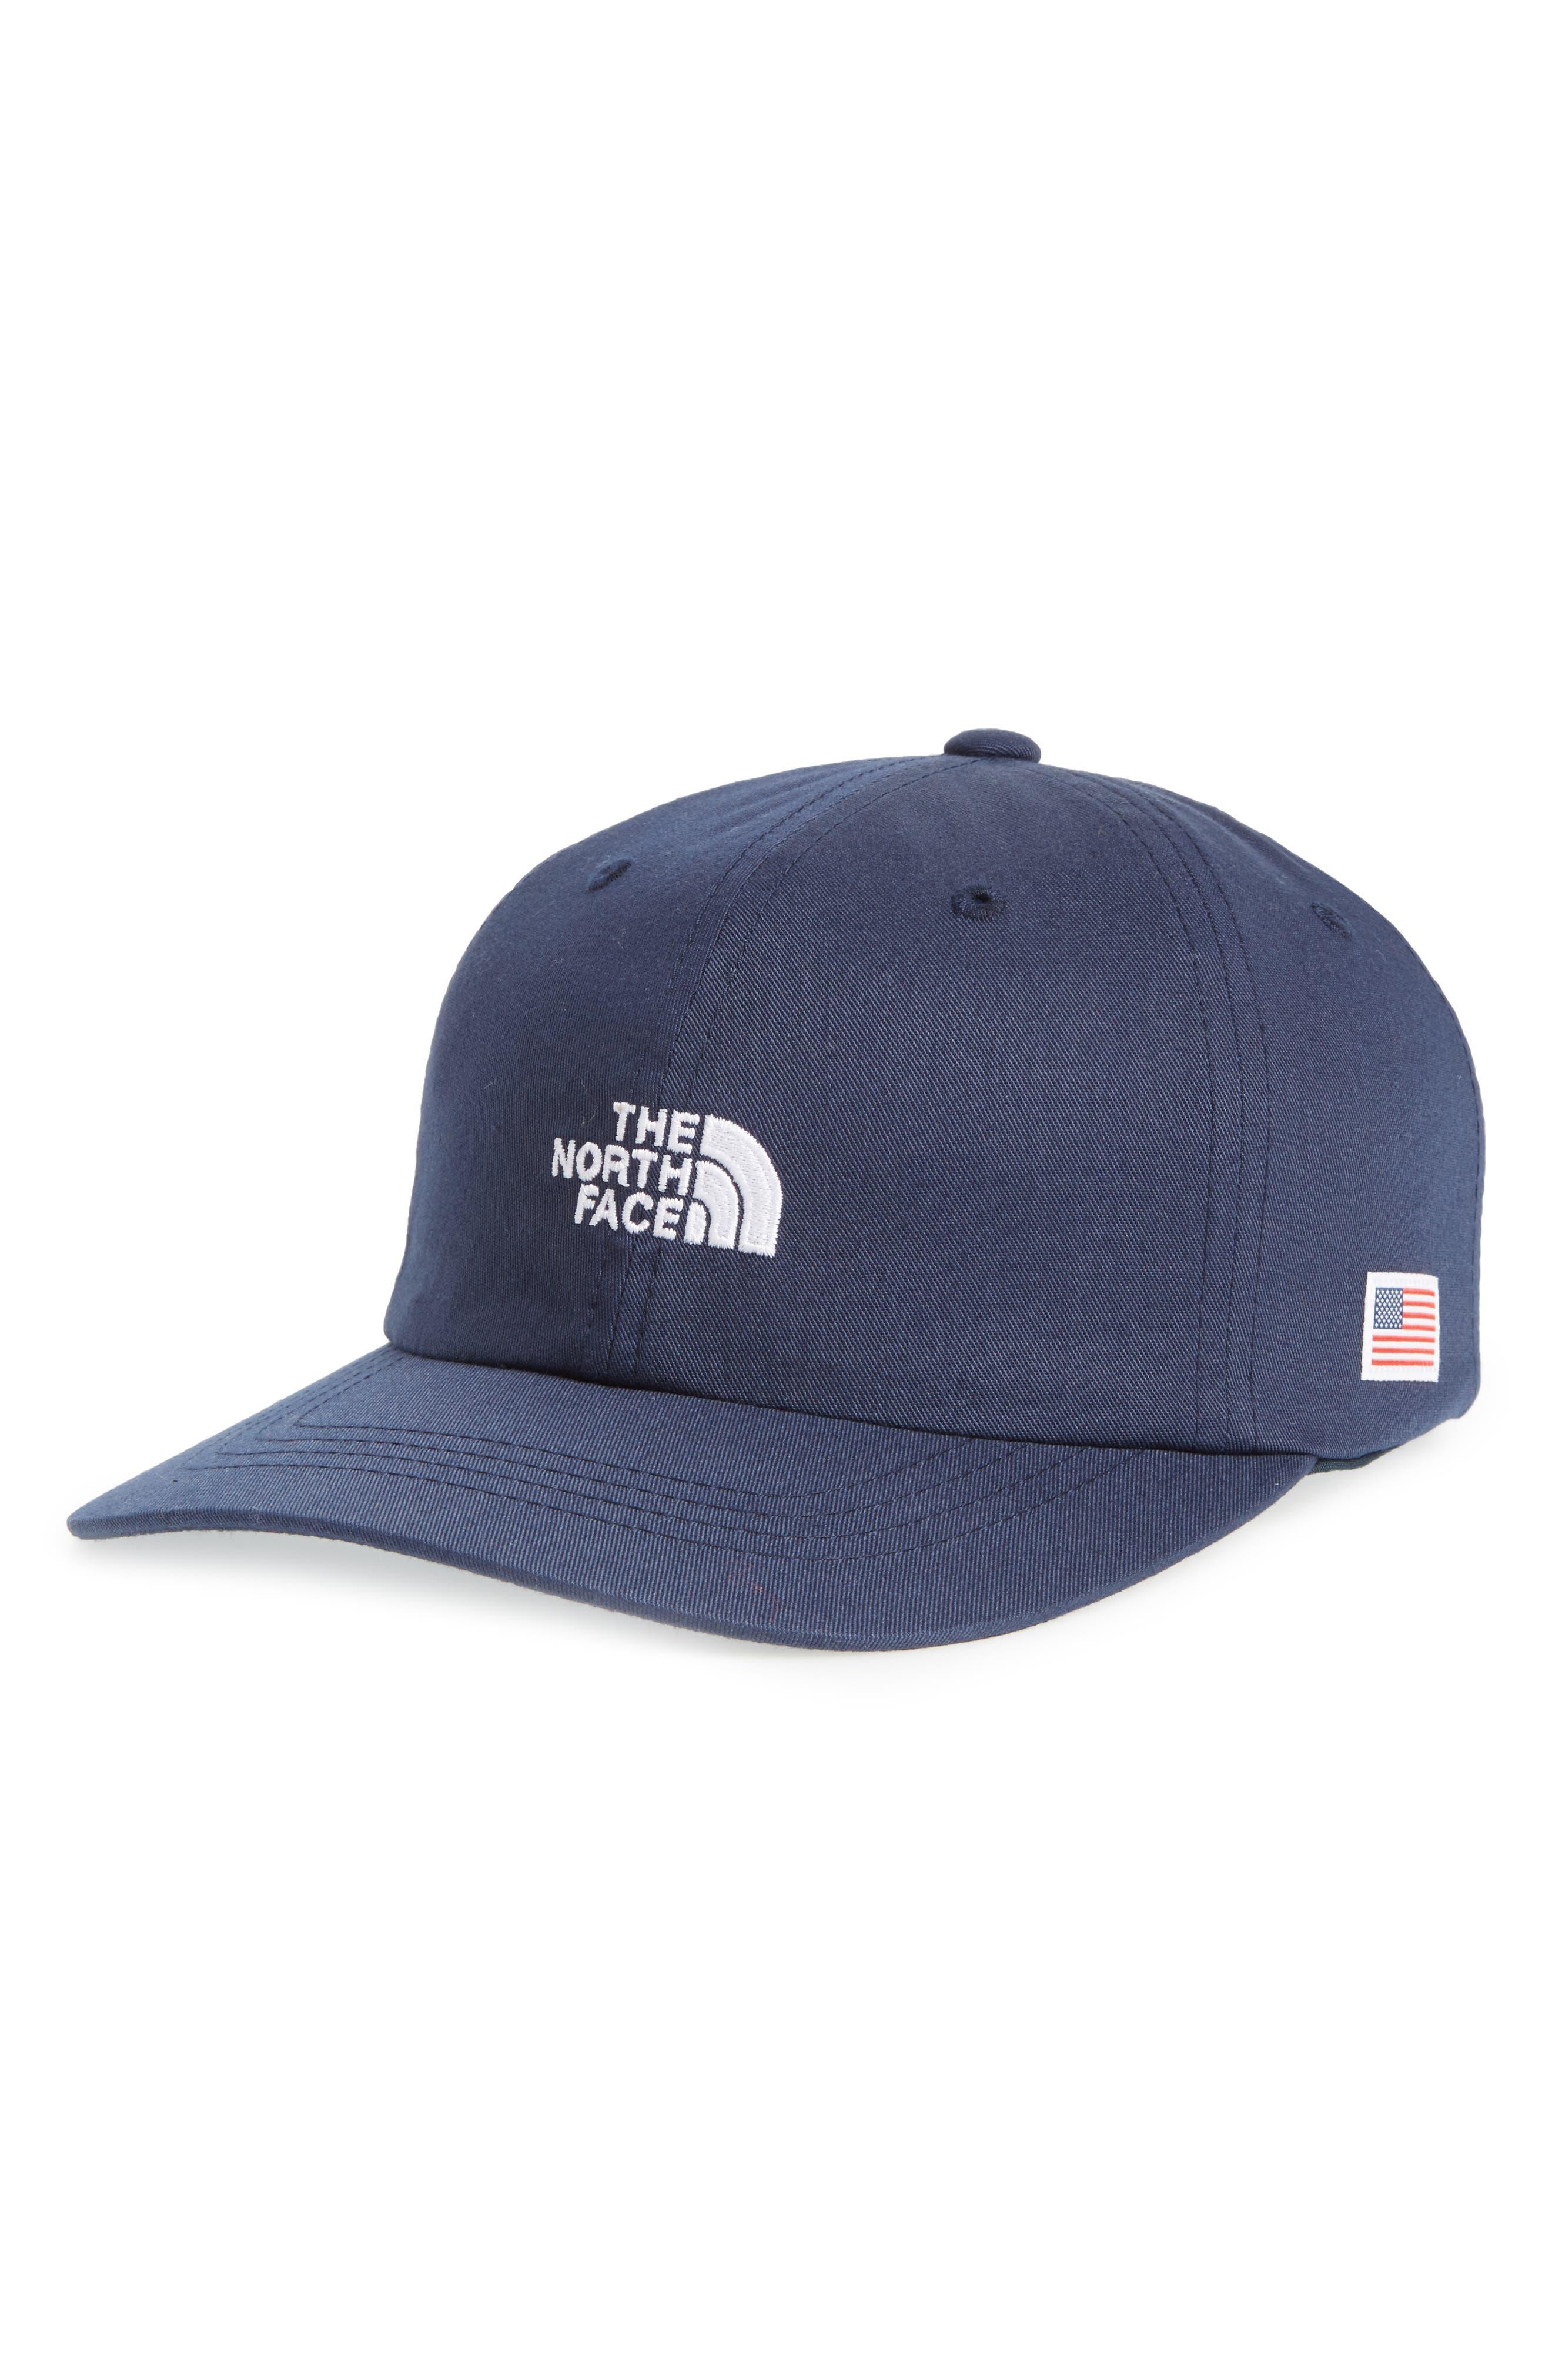 International Collection Baseball Cap,                         Main,                         color, Cosmic Blue